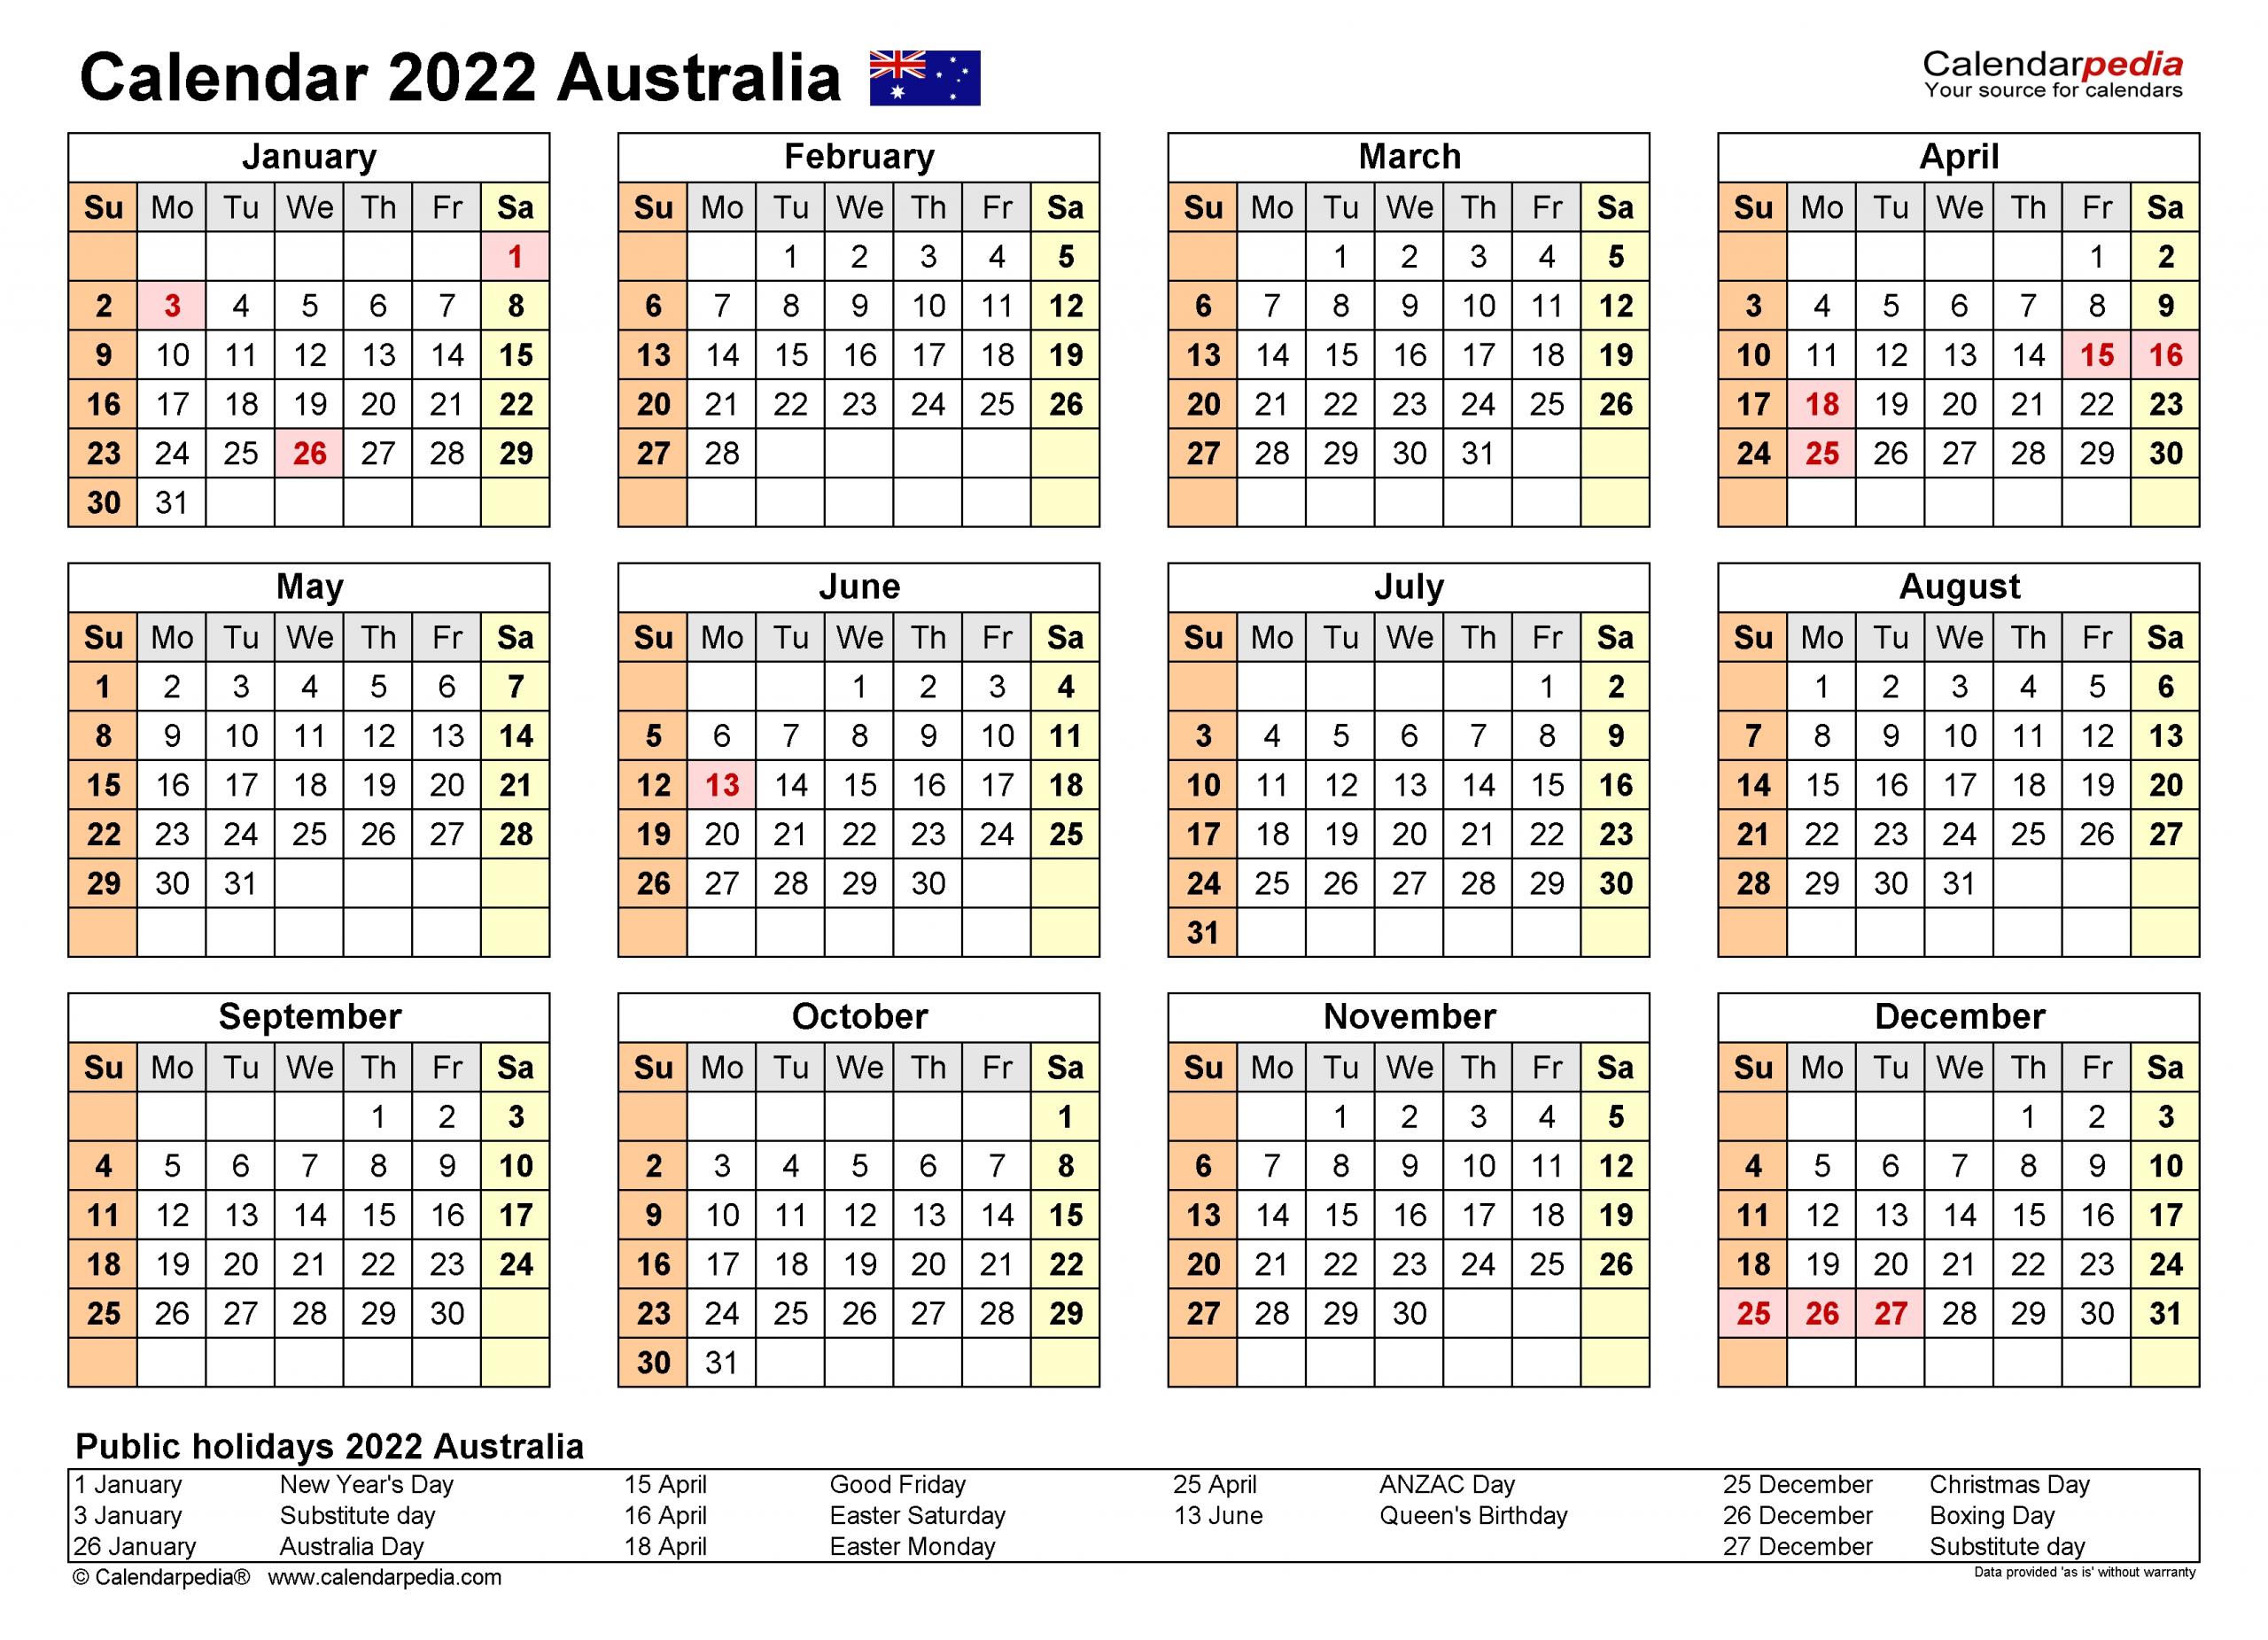 Australia Calendar 2022 - Free Printable Pdf Templates  18 19 Financial Year Dates Australia